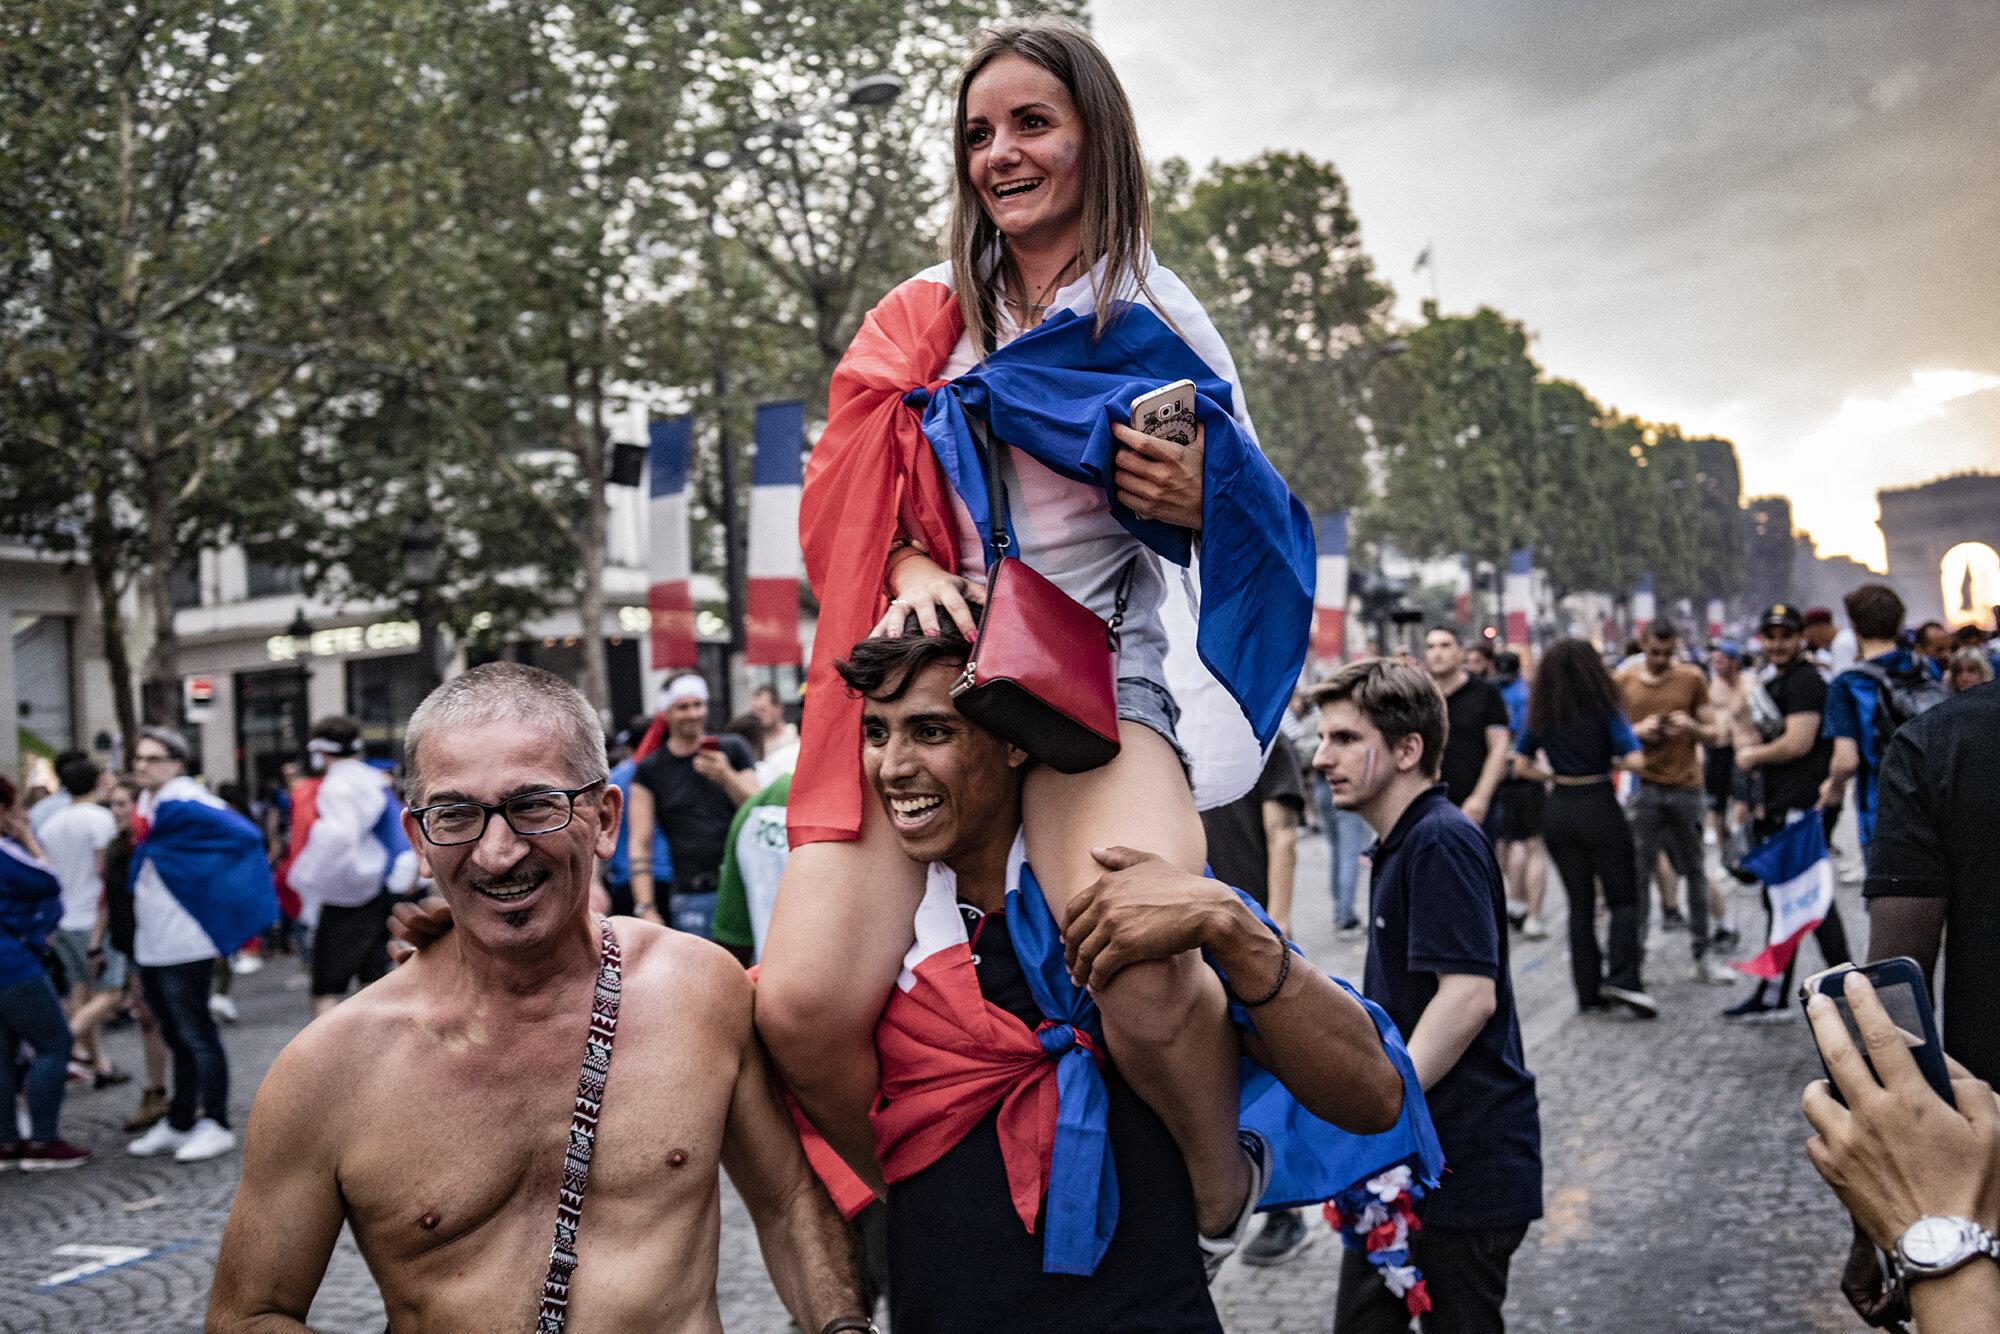 Paris_World_Cup_Celebration_2018-408.jpg